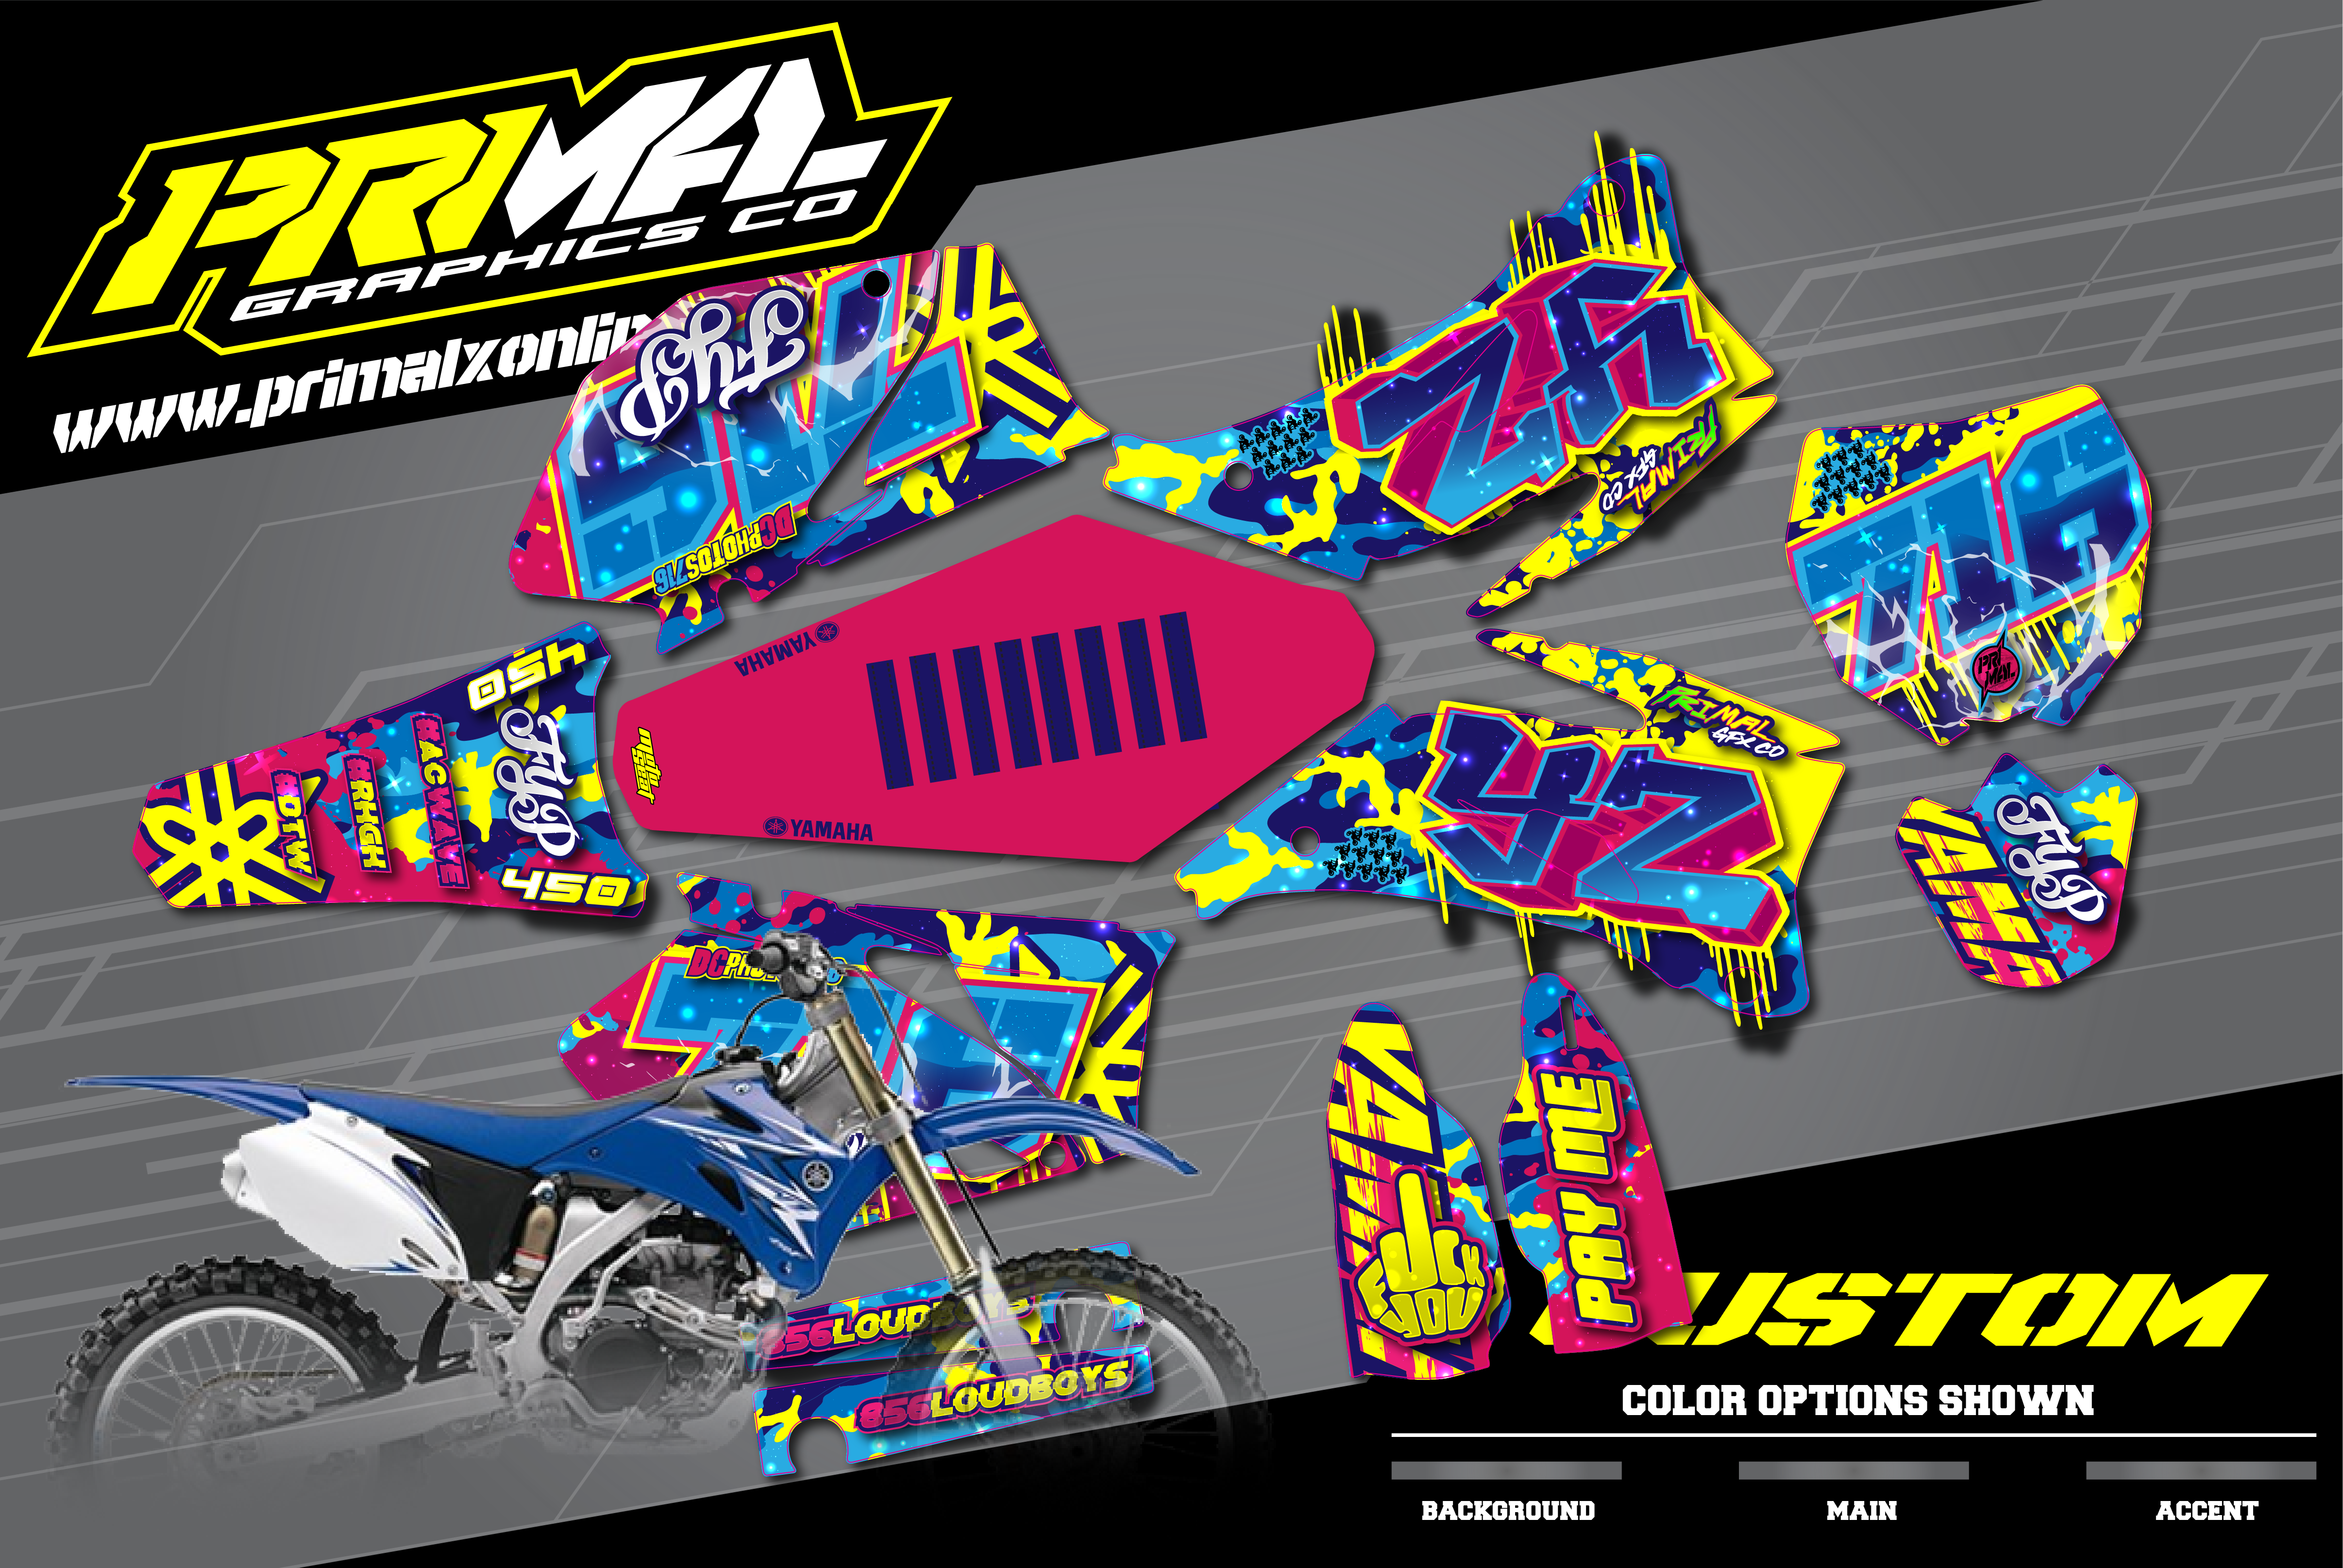 1_PRIMAL-X-MOTORSPORTS-PRIMAL-GRAPHICS-CO-YAMAHA-yz450F-yz250-CUSTOM-GRAPHICS-KIT-BIKELIFE-RETRO-716-01